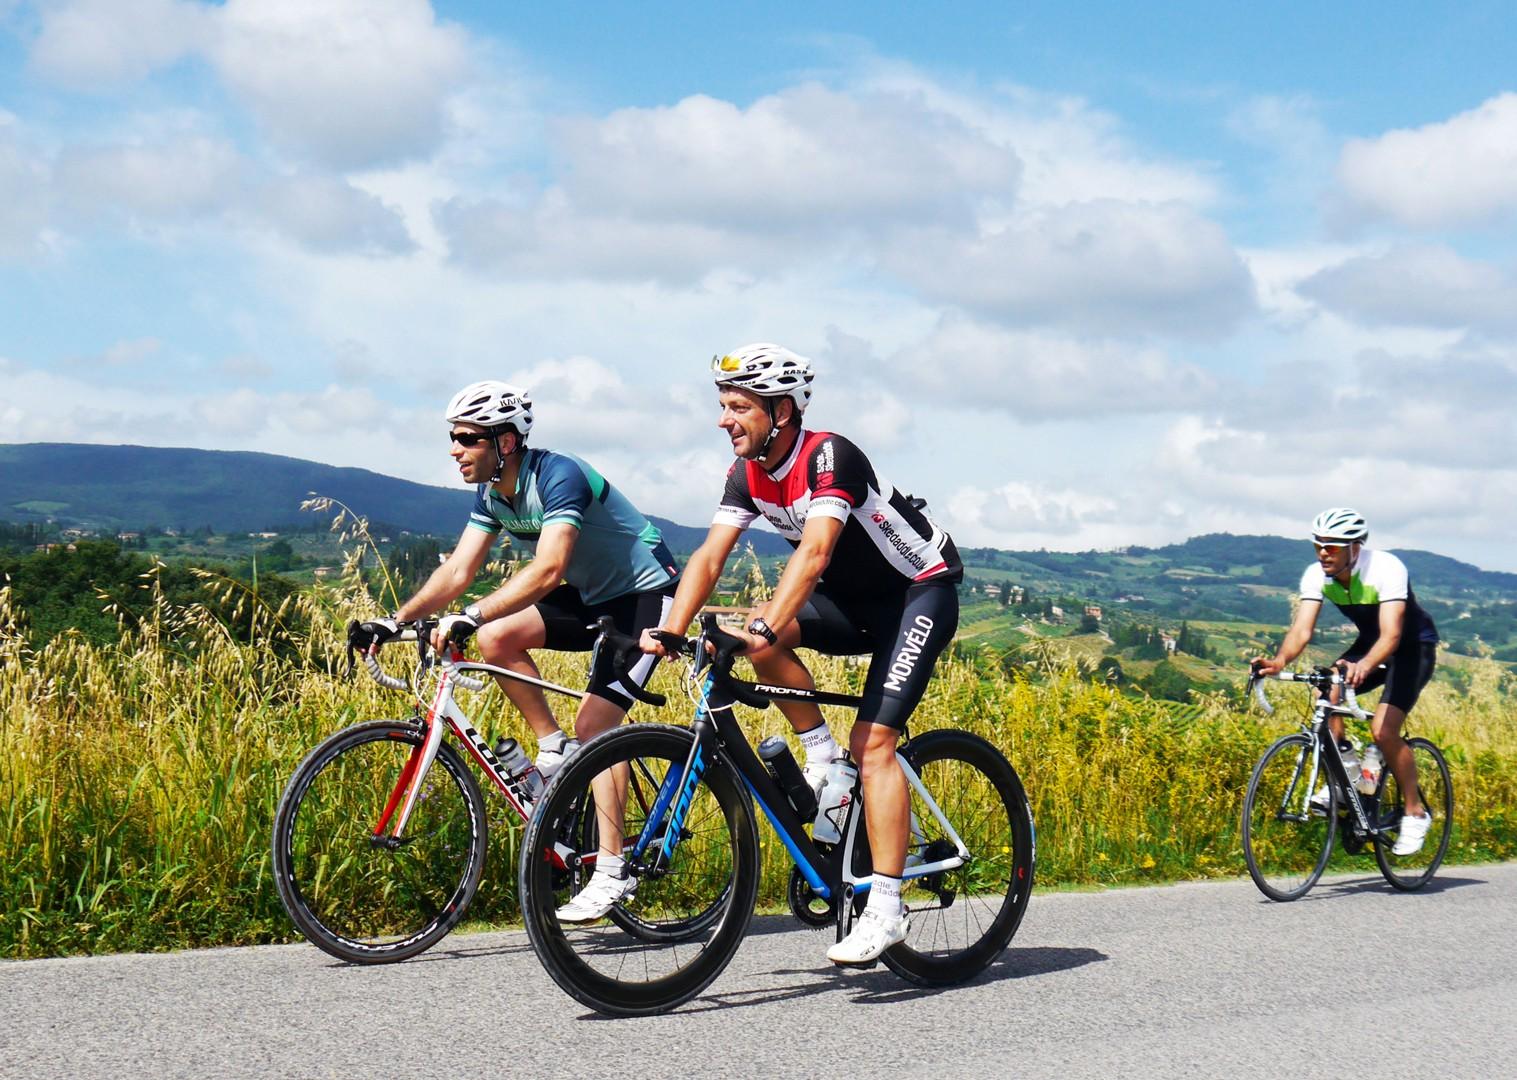 cycling-italy-tuscany-road-self-guided.jpg - Italy - Tuscany Tourer - Self Guided Road Cycling Holiday - Road Cycling